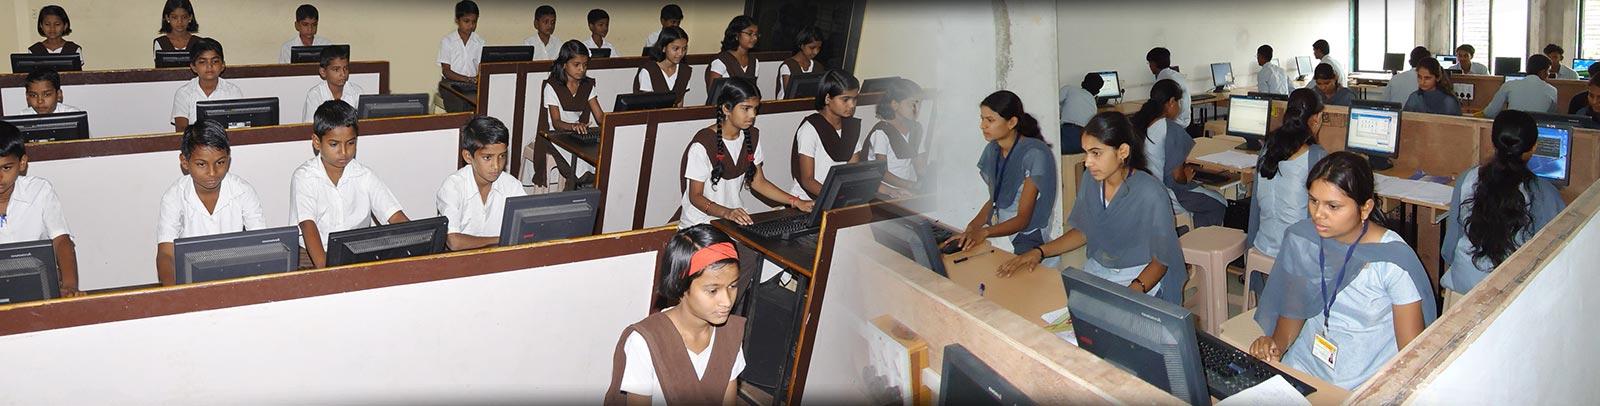 Students at computer lab